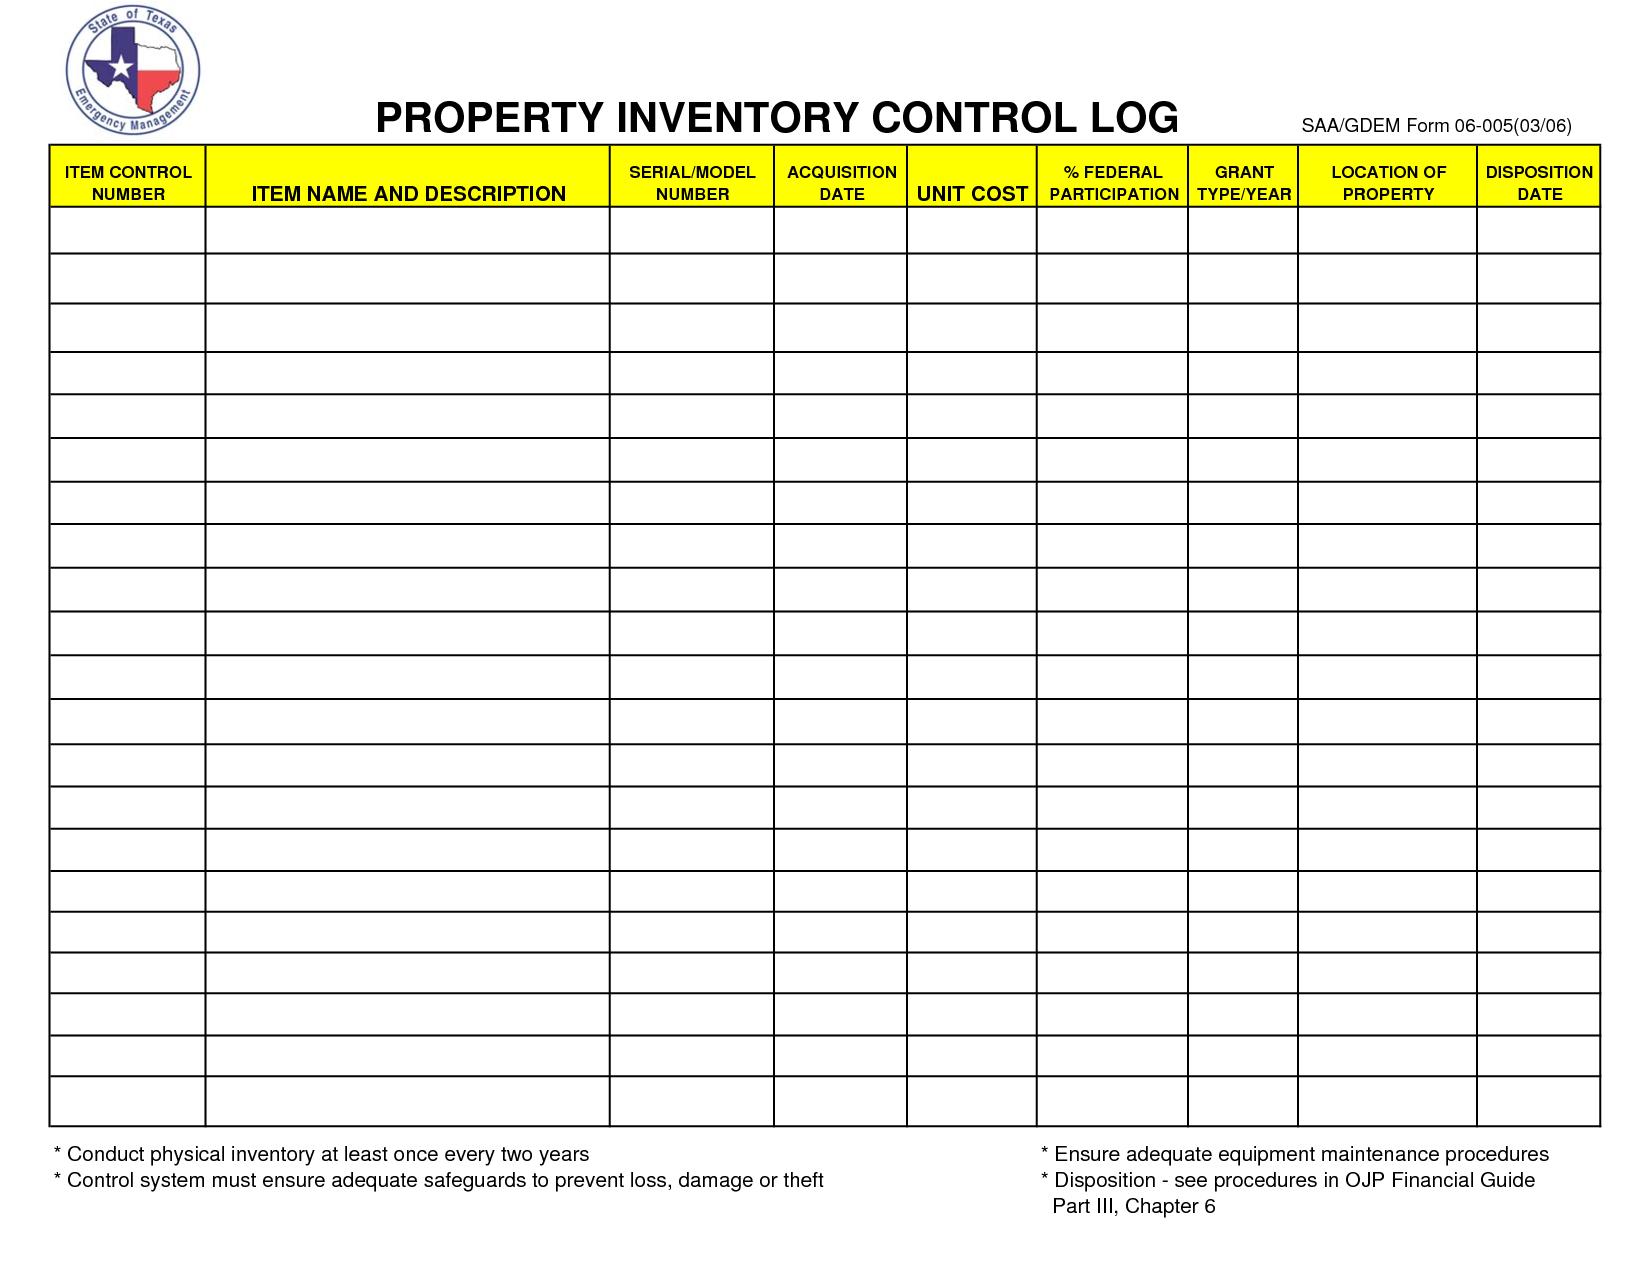 Estate Inventory Excel Spreadsheet For Excel Spreadsheet